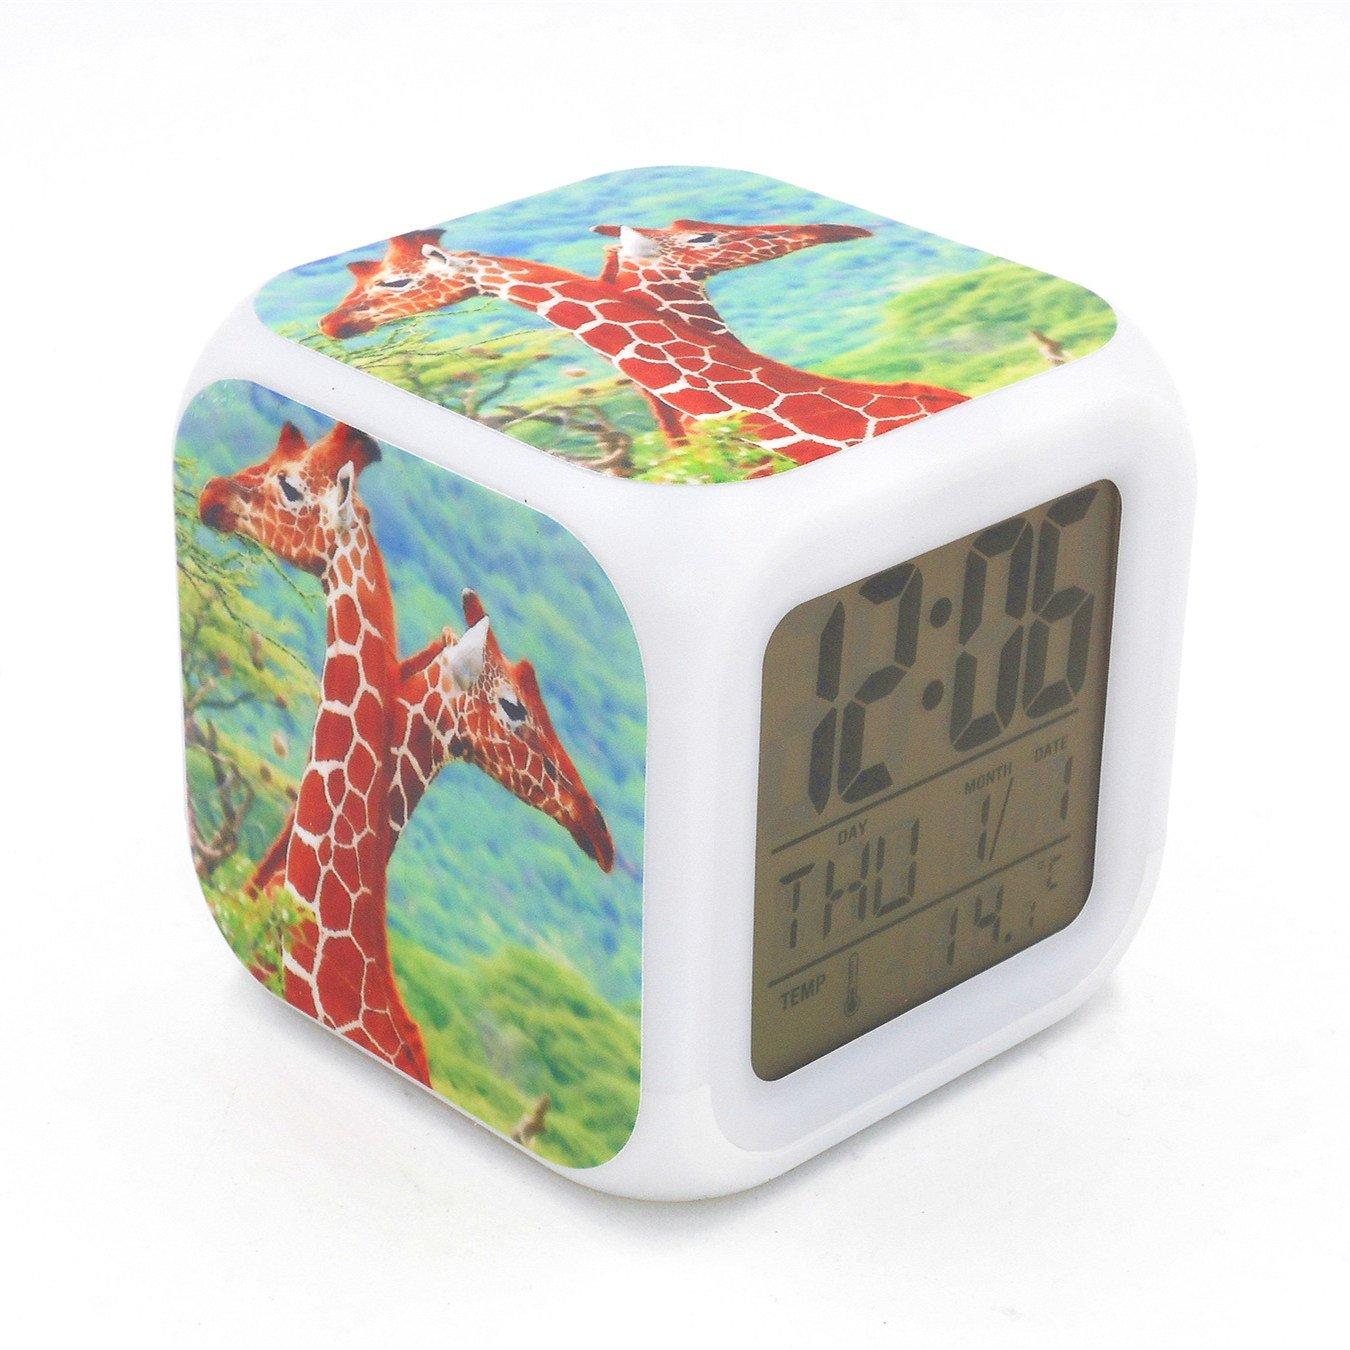 Boyan Led Alarm Clock Giraffe Animal Design Green Creative Desk Table Clock Glowing Led Digital Alarm Clock for Unisex Adults Kids Toy Gift